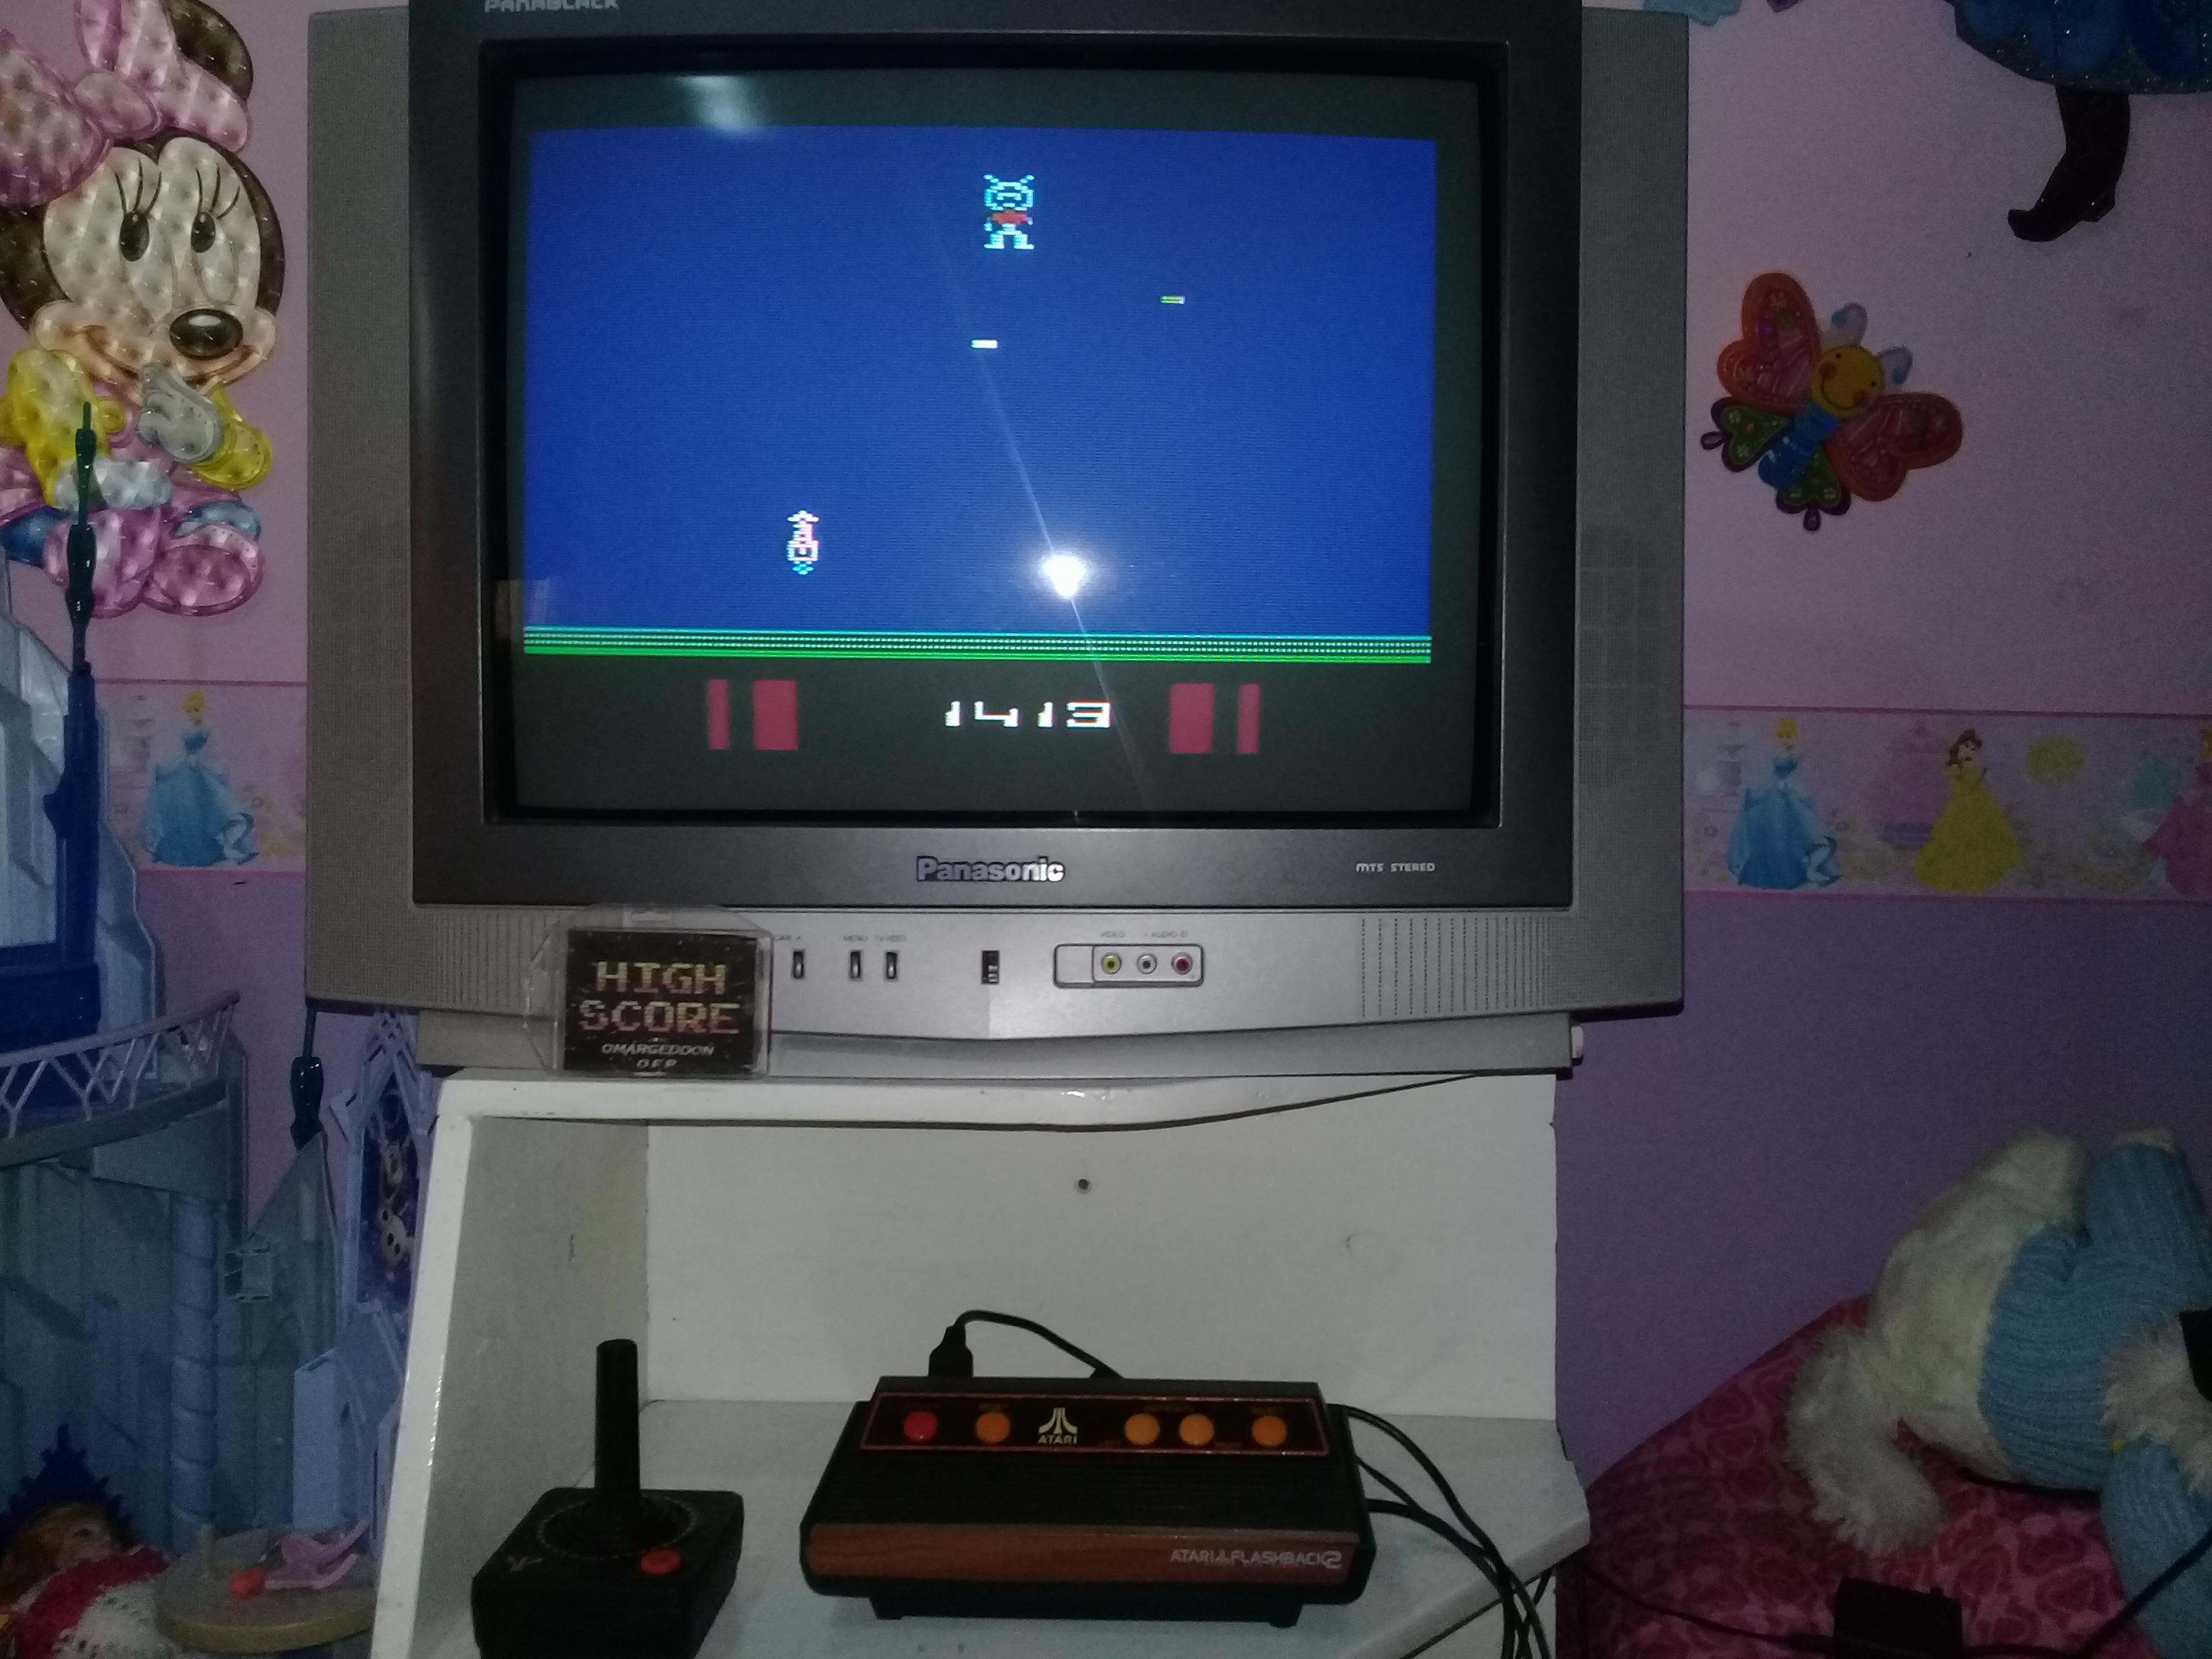 omargeddon: Saboteur (Atari 2600 Emulated Novice/B Mode) 1,413 points on 2019-05-06 17:56:56